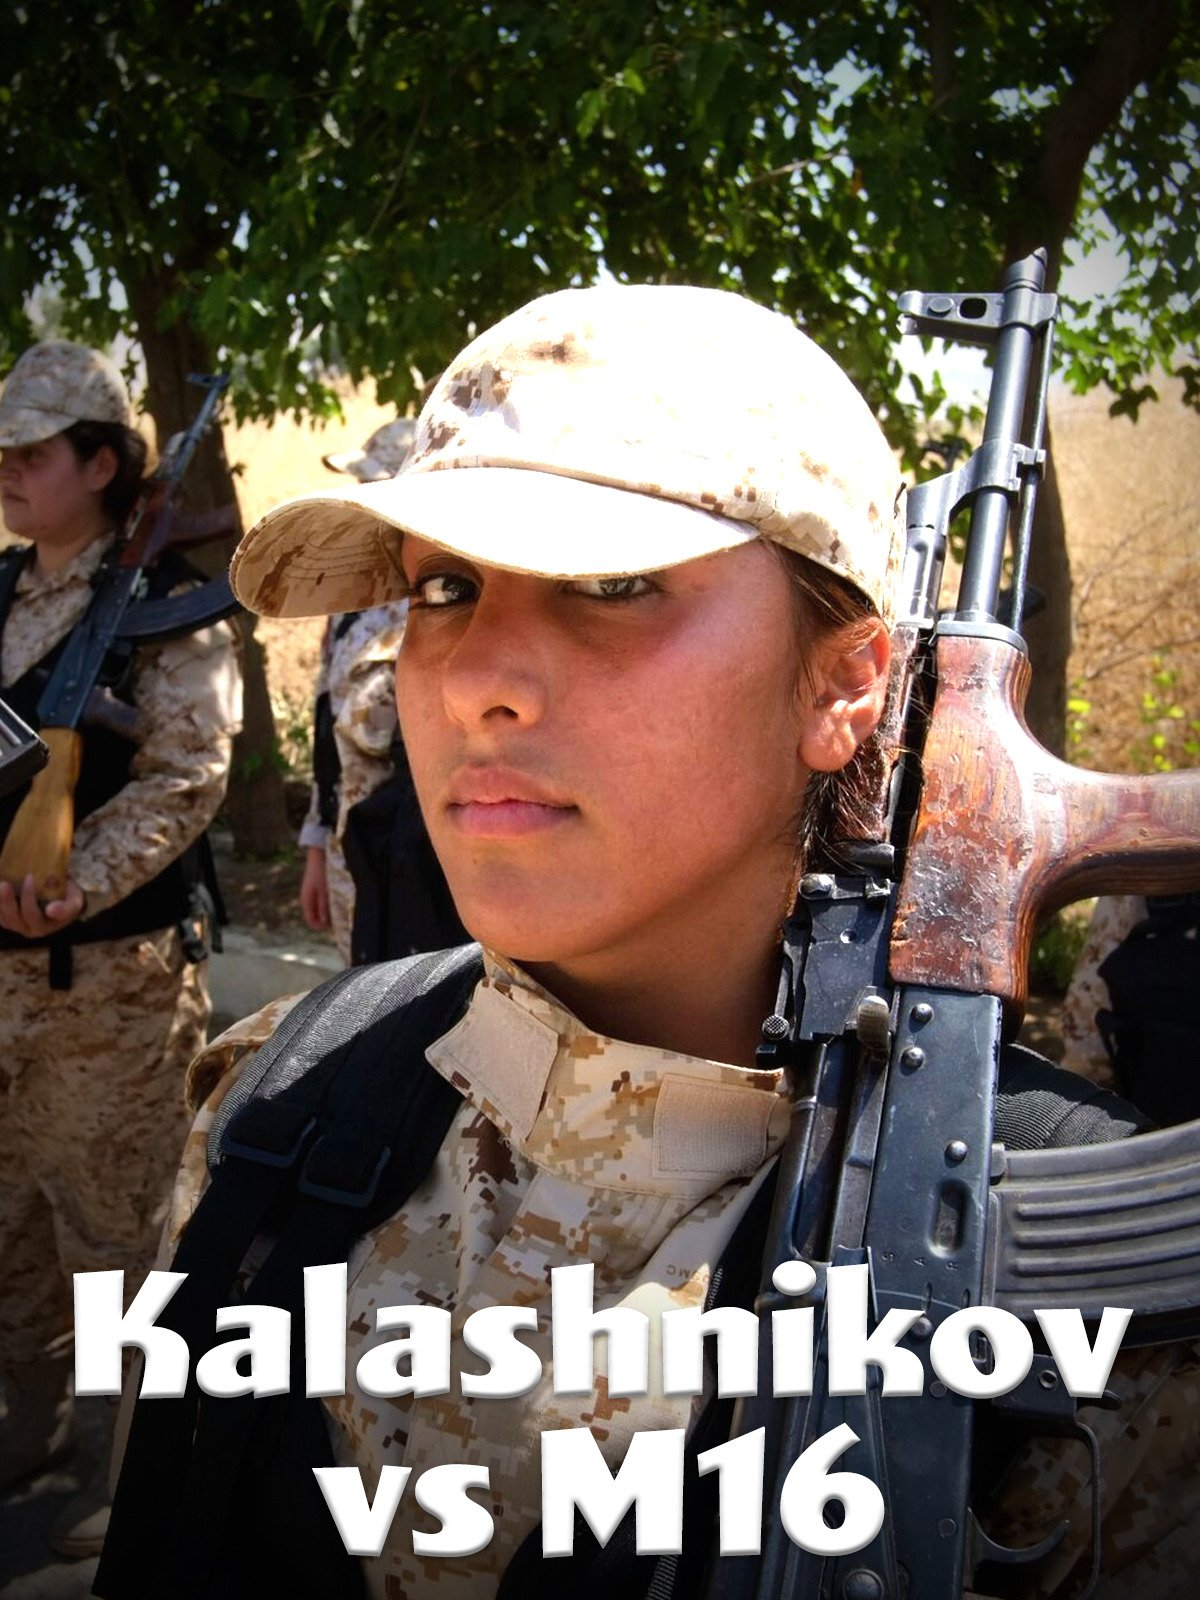 Kalashnikov vs M16